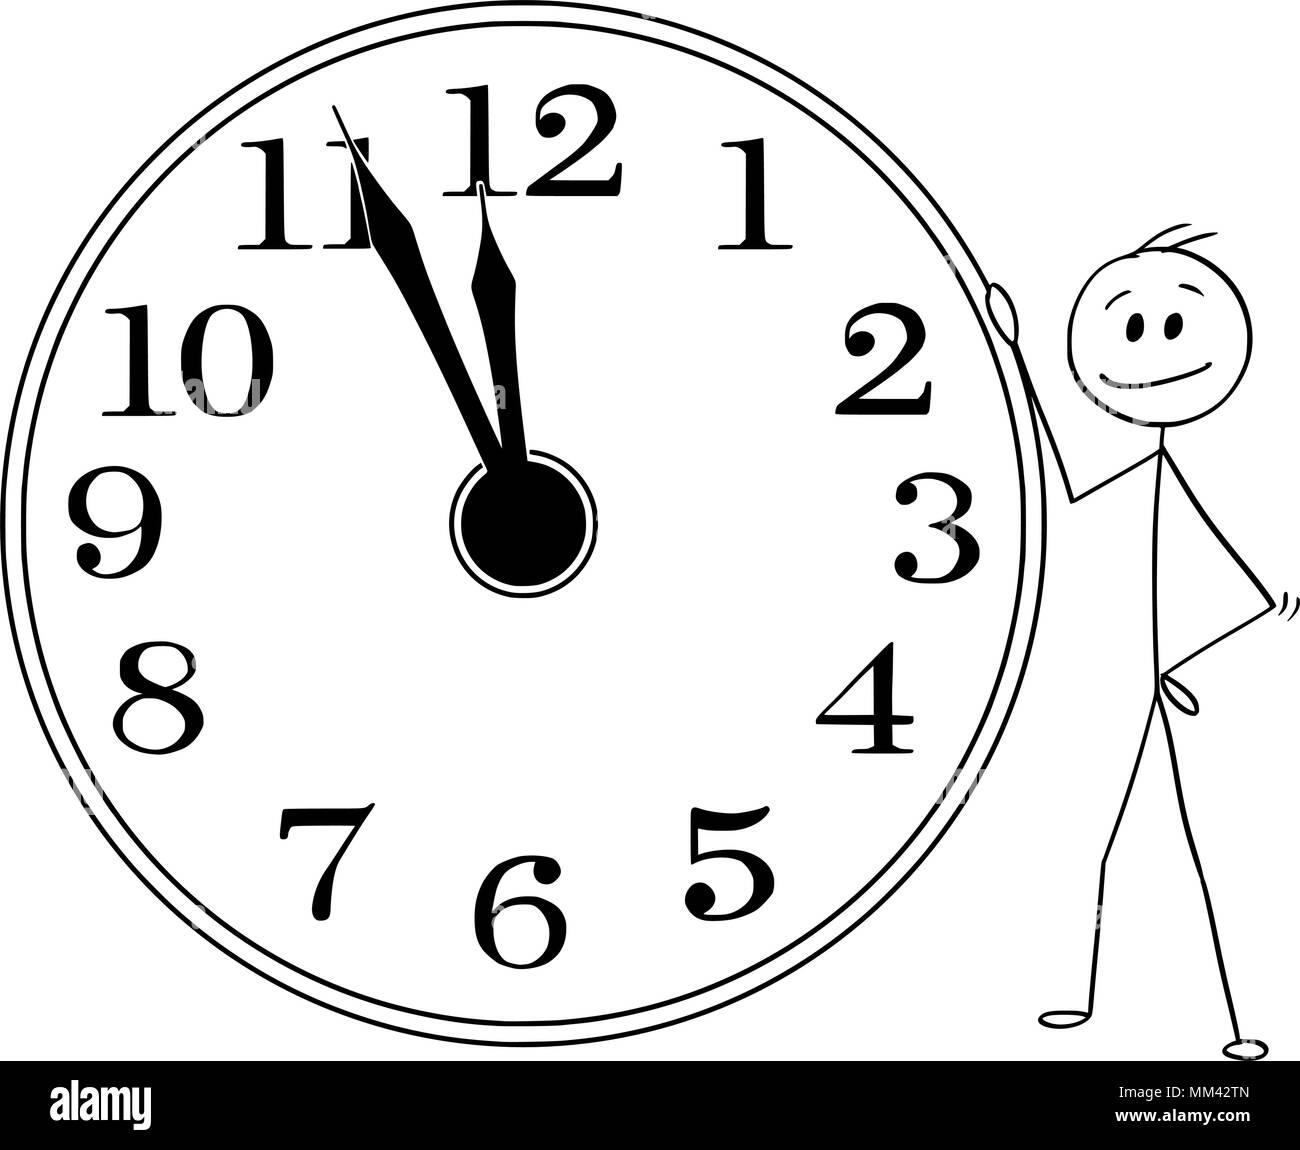 Cartoon Of Smiling Man Or Businessman Holding Big Wall Clock Five